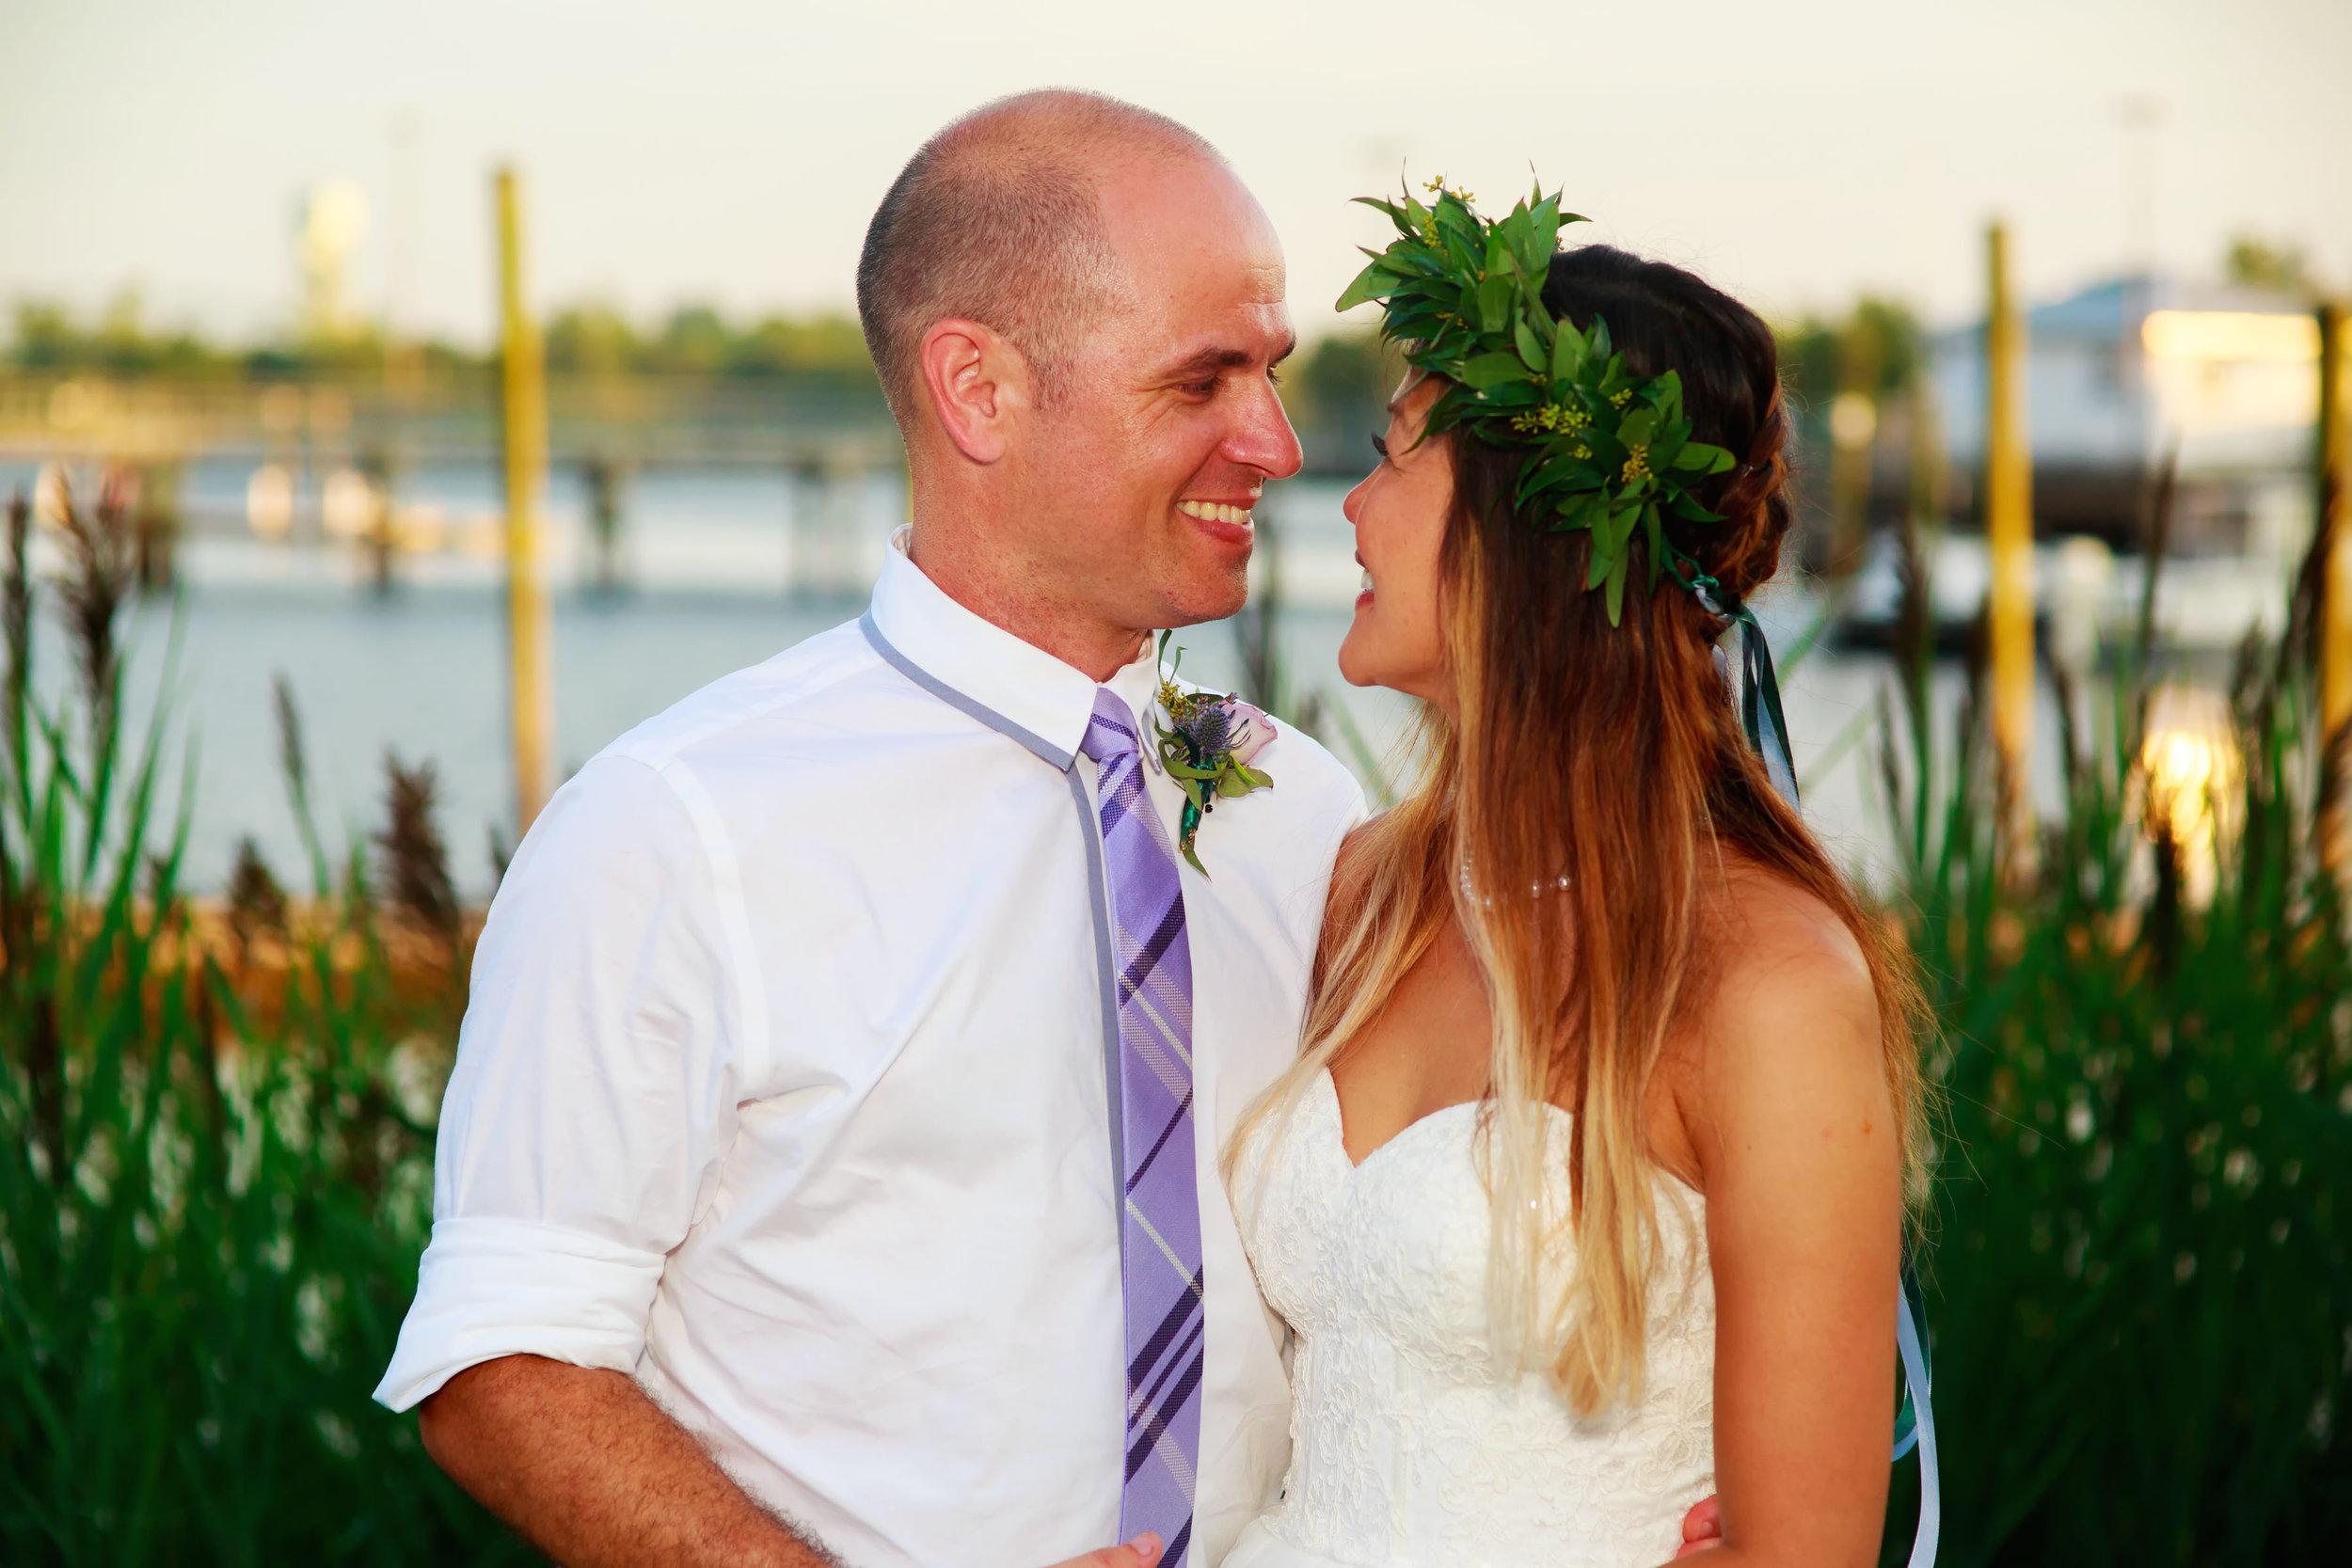 North_Carolina_Wedding_Photographer_Tiffany_Abruzzo_Bride&Groom_20.jpg